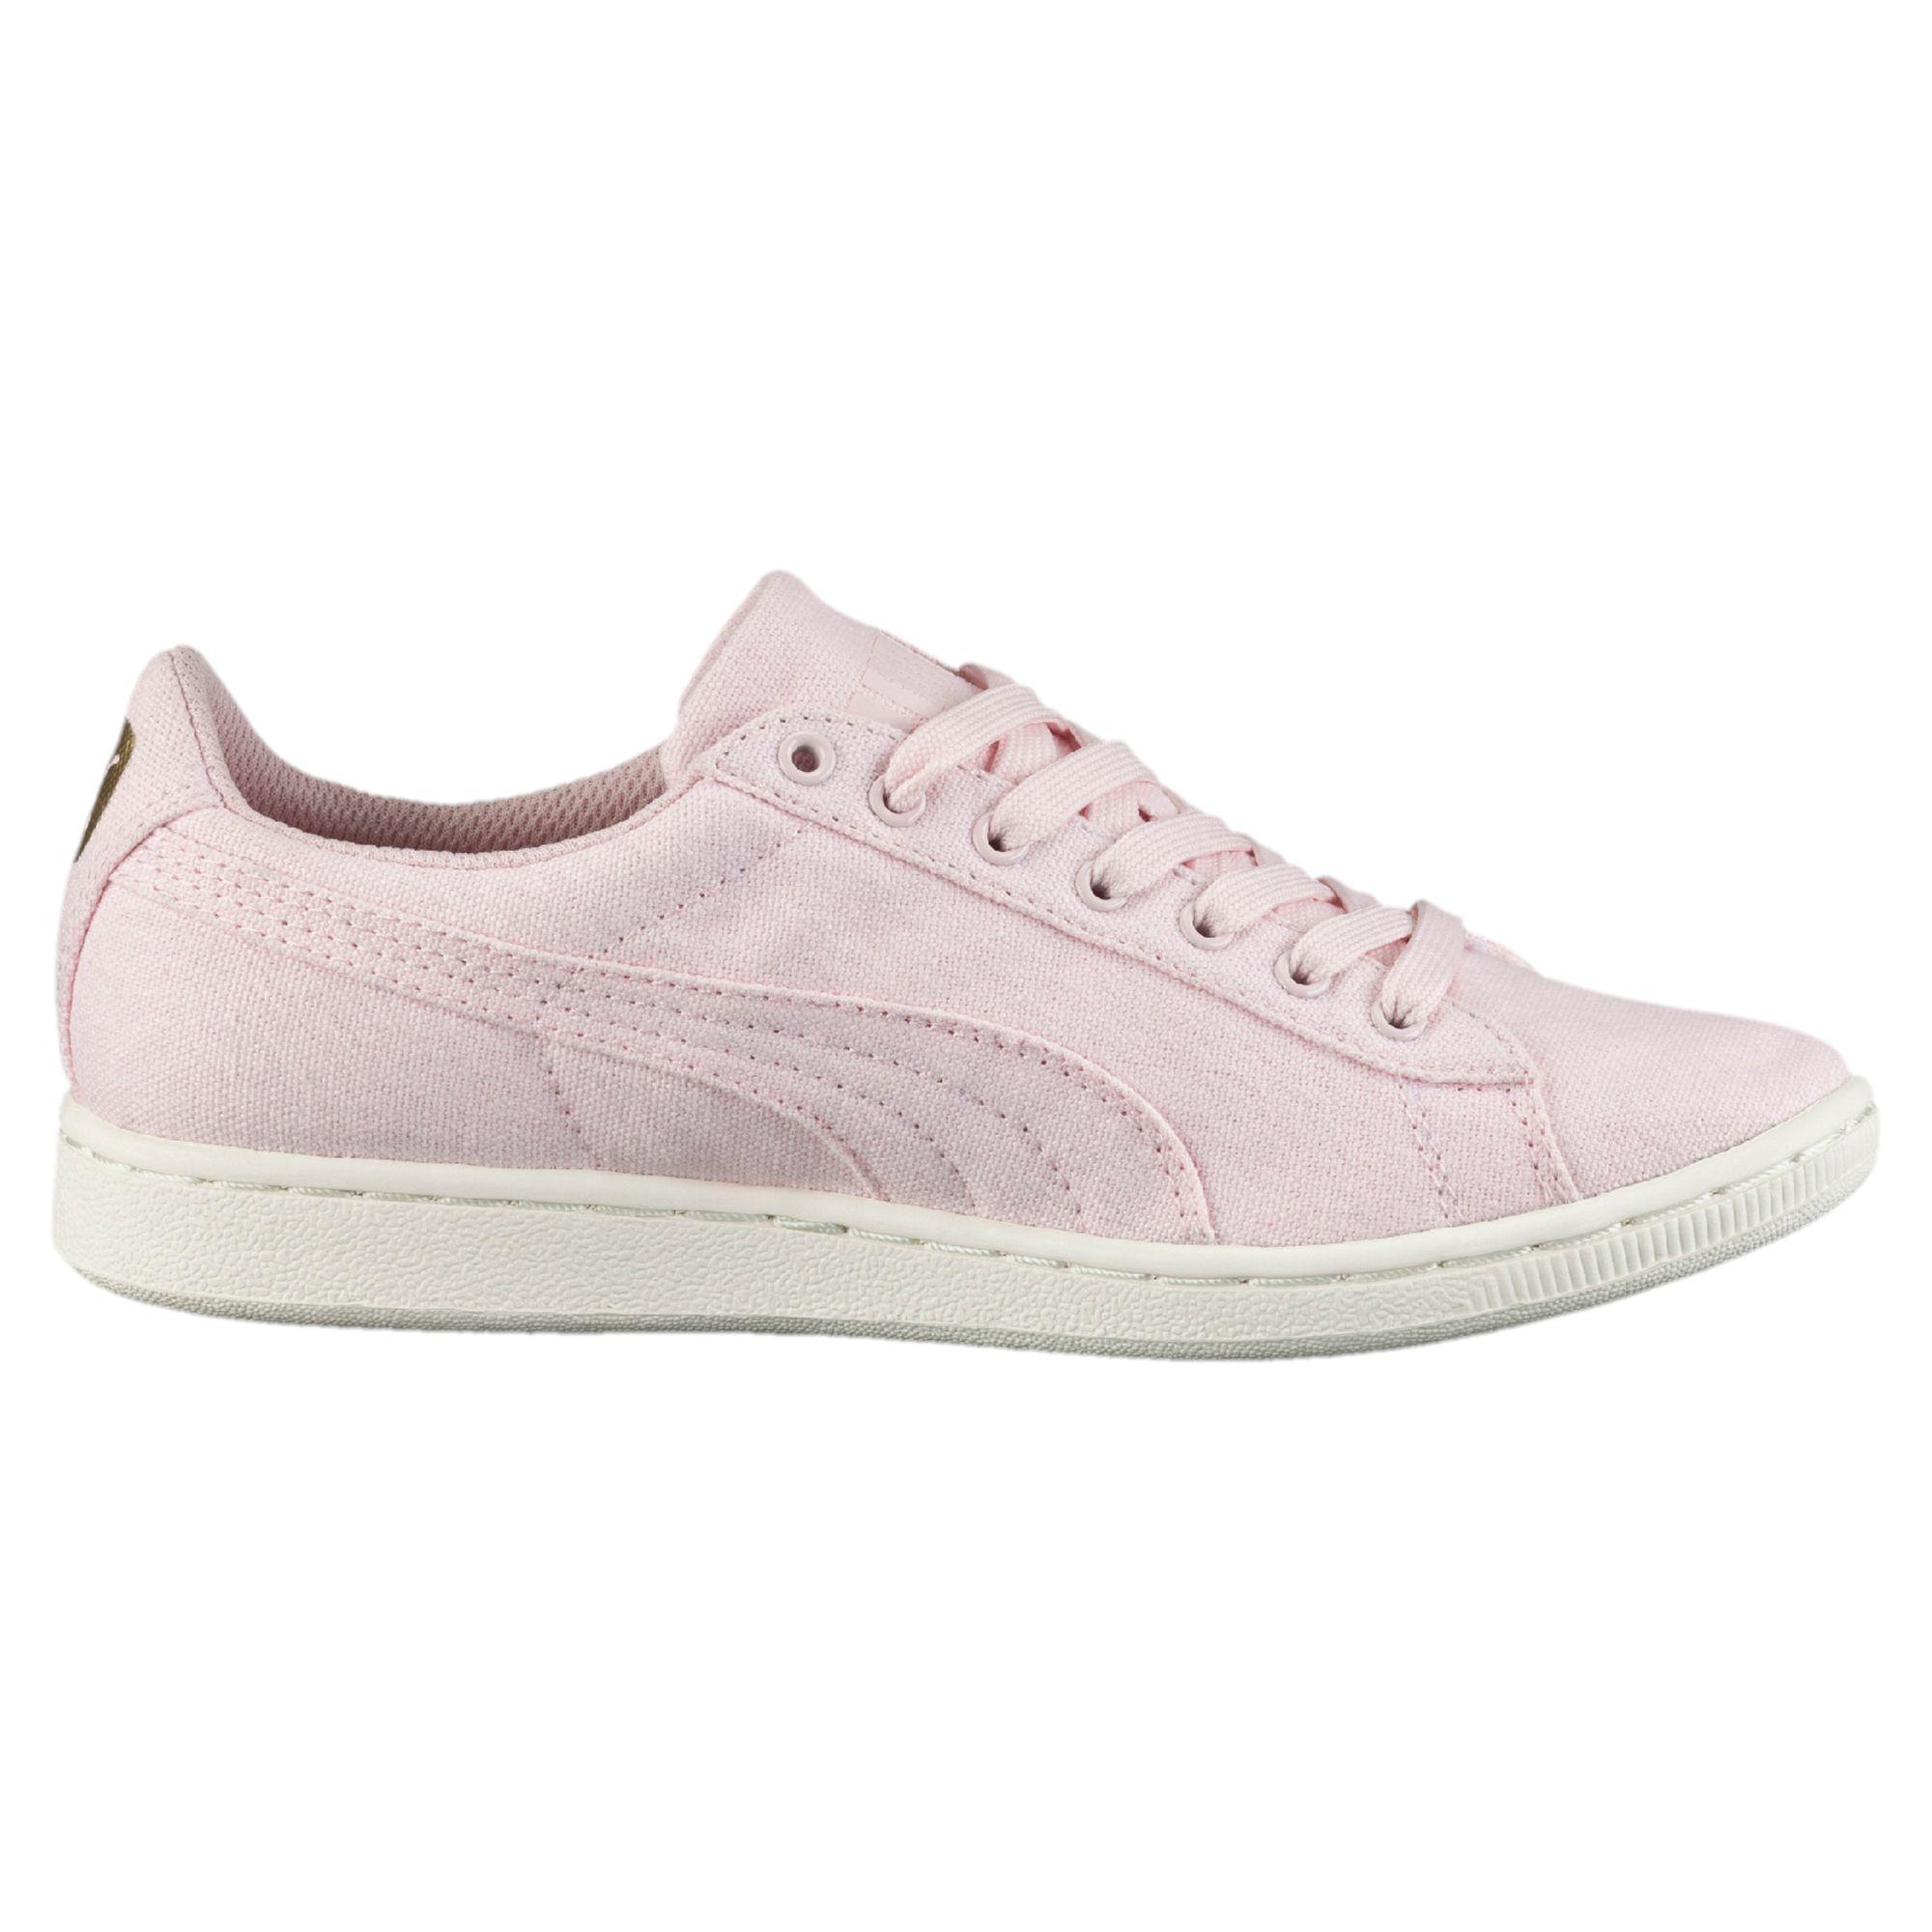 8aa8e6da9307 Lyst - PUMA Vikky Canvas Women s Sneakers in Pink